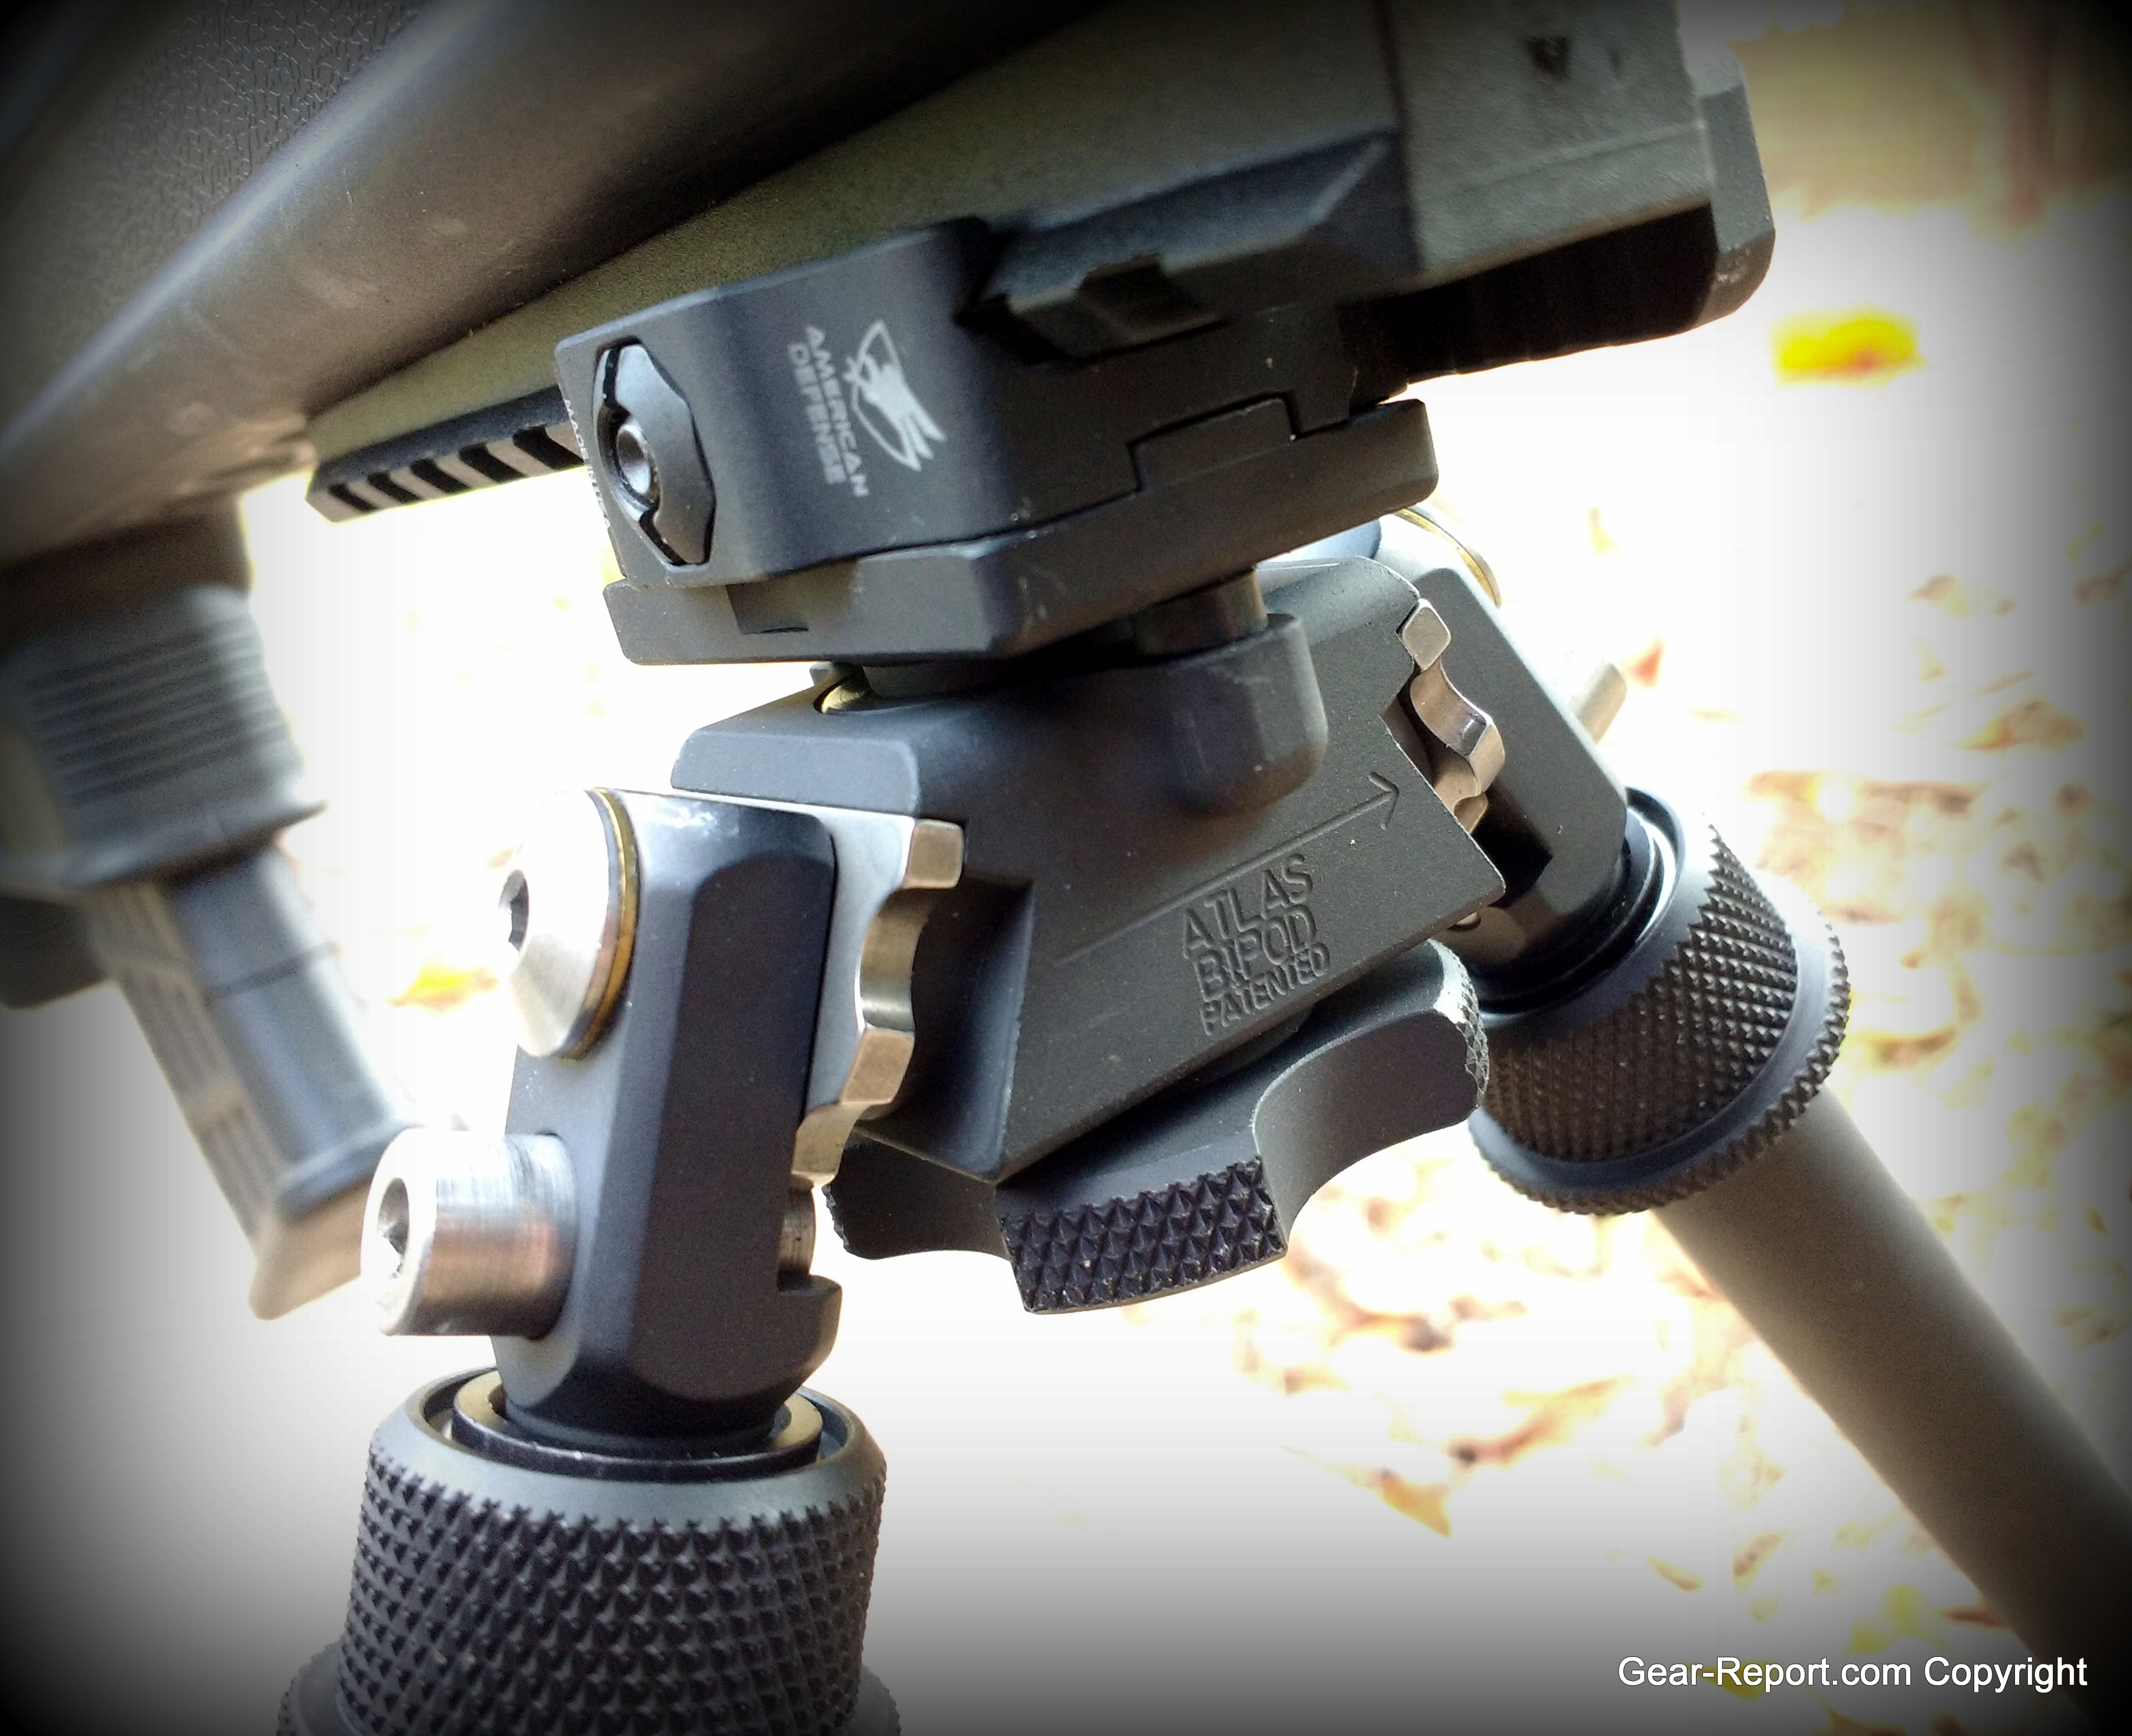 Atlas Bipod: BT47-LW17 PSR Precision Sniper Rifle Bipod Review